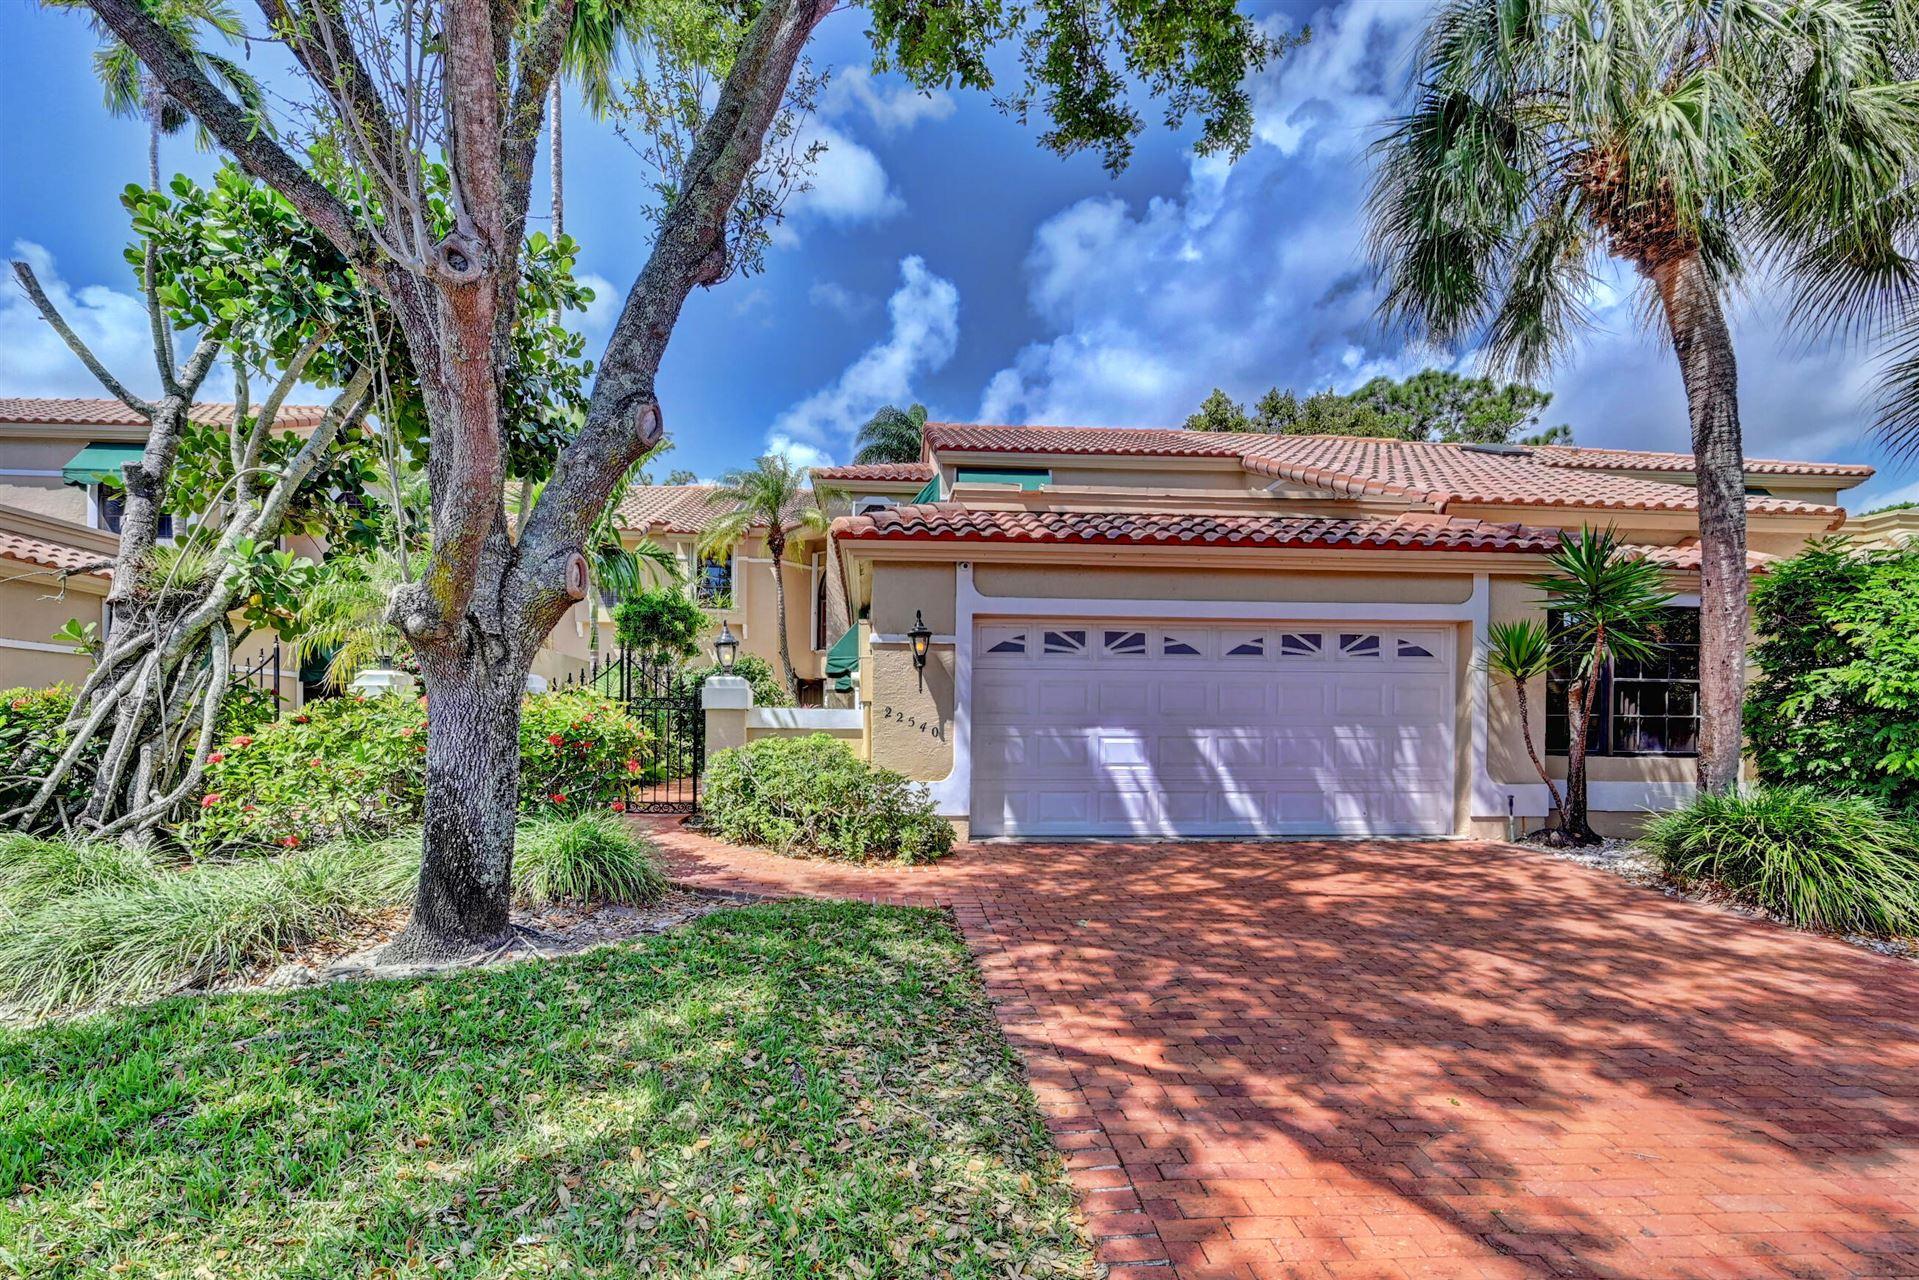 22540 Caravelle Circle, Boca Raton, FL 33433 - #: RX-10706702